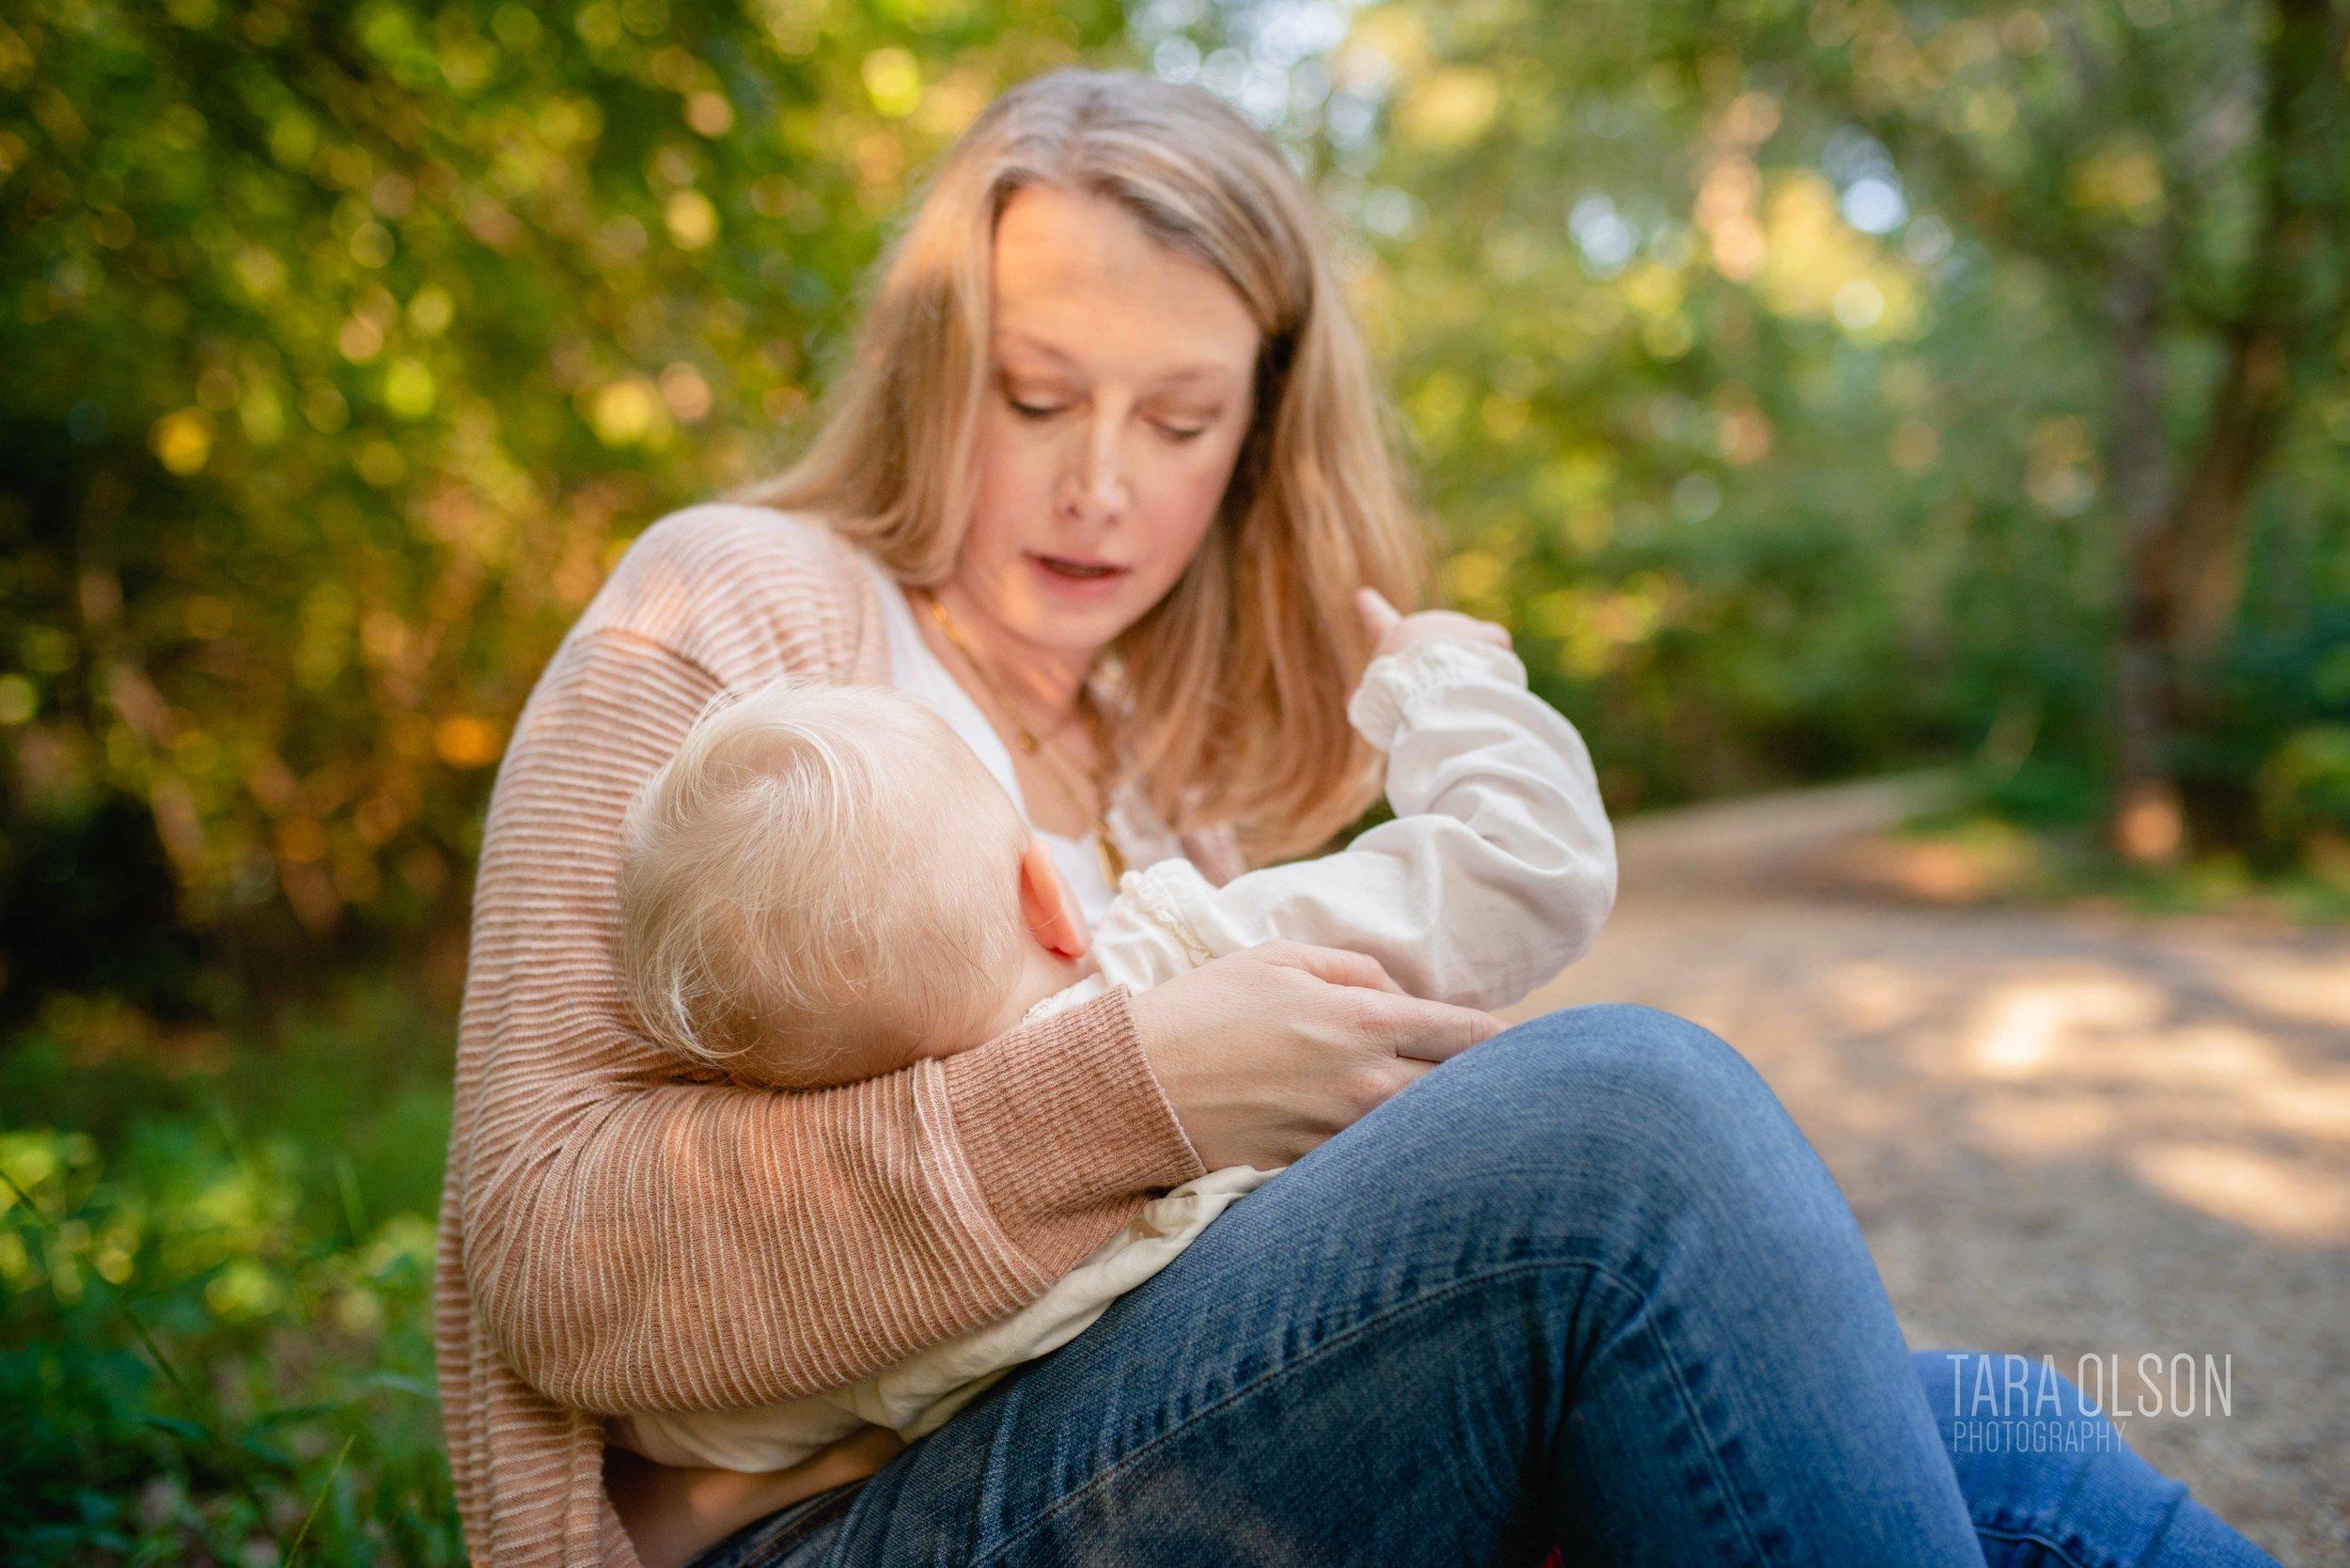 Hawkins_Arlington-Virginia-Family-Photographer_Tara-Olson-Photography_4192.jpg